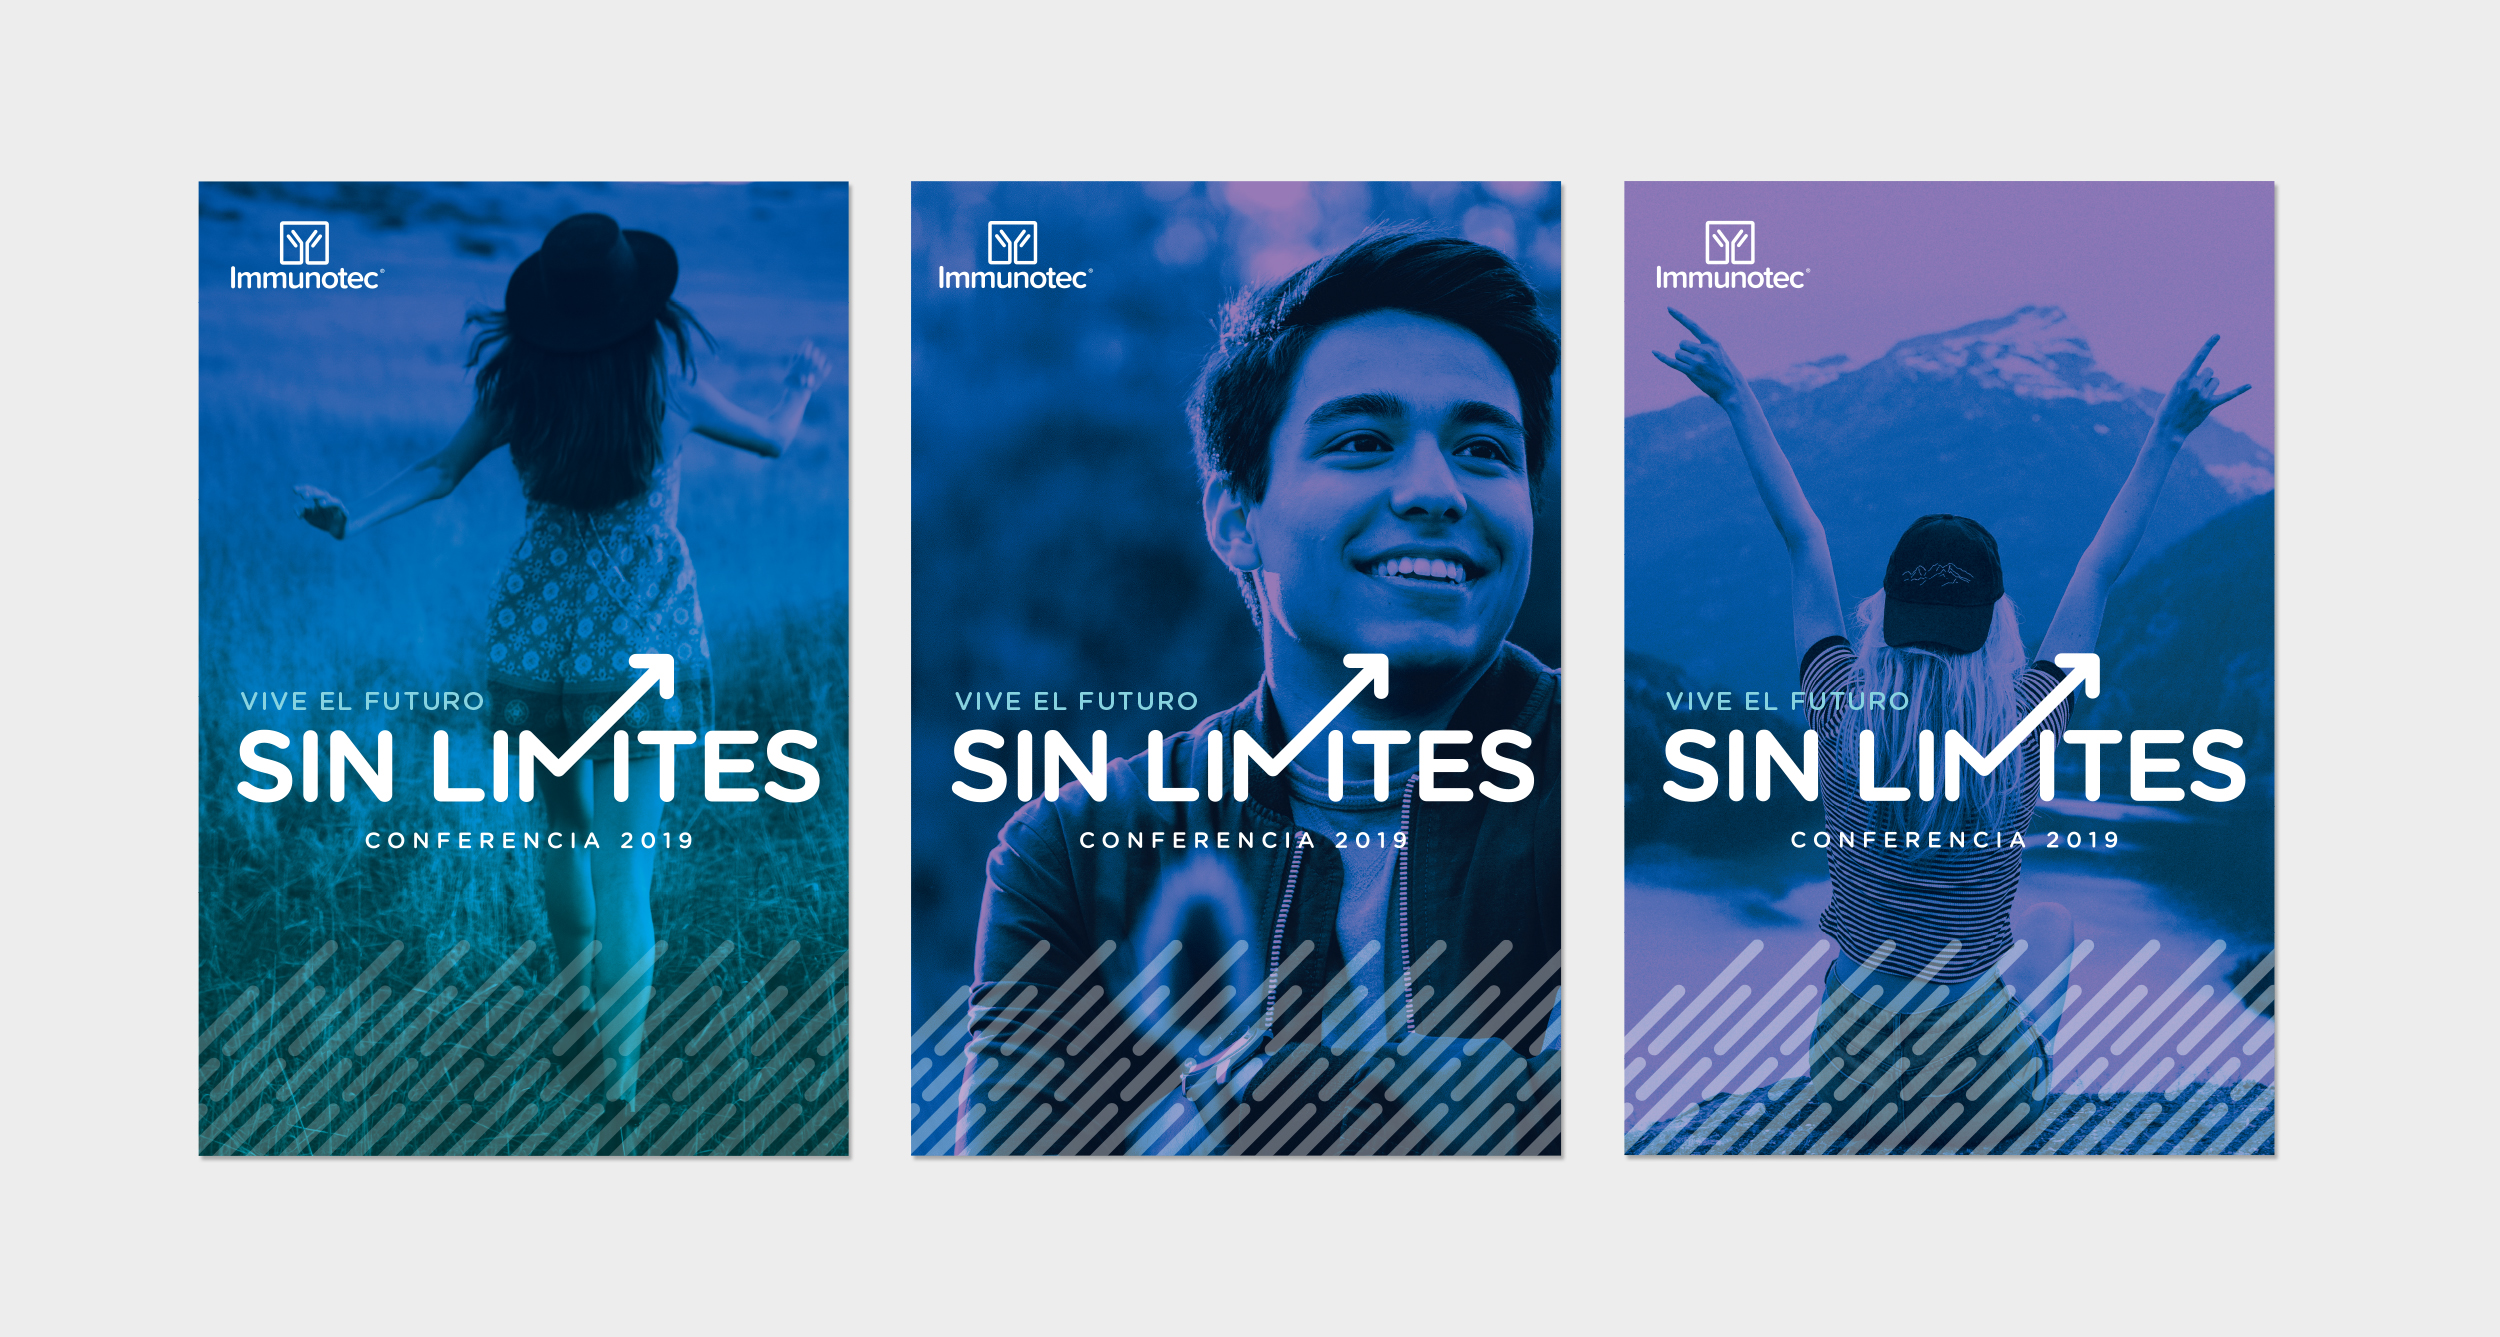 sinlimites_02.jpg